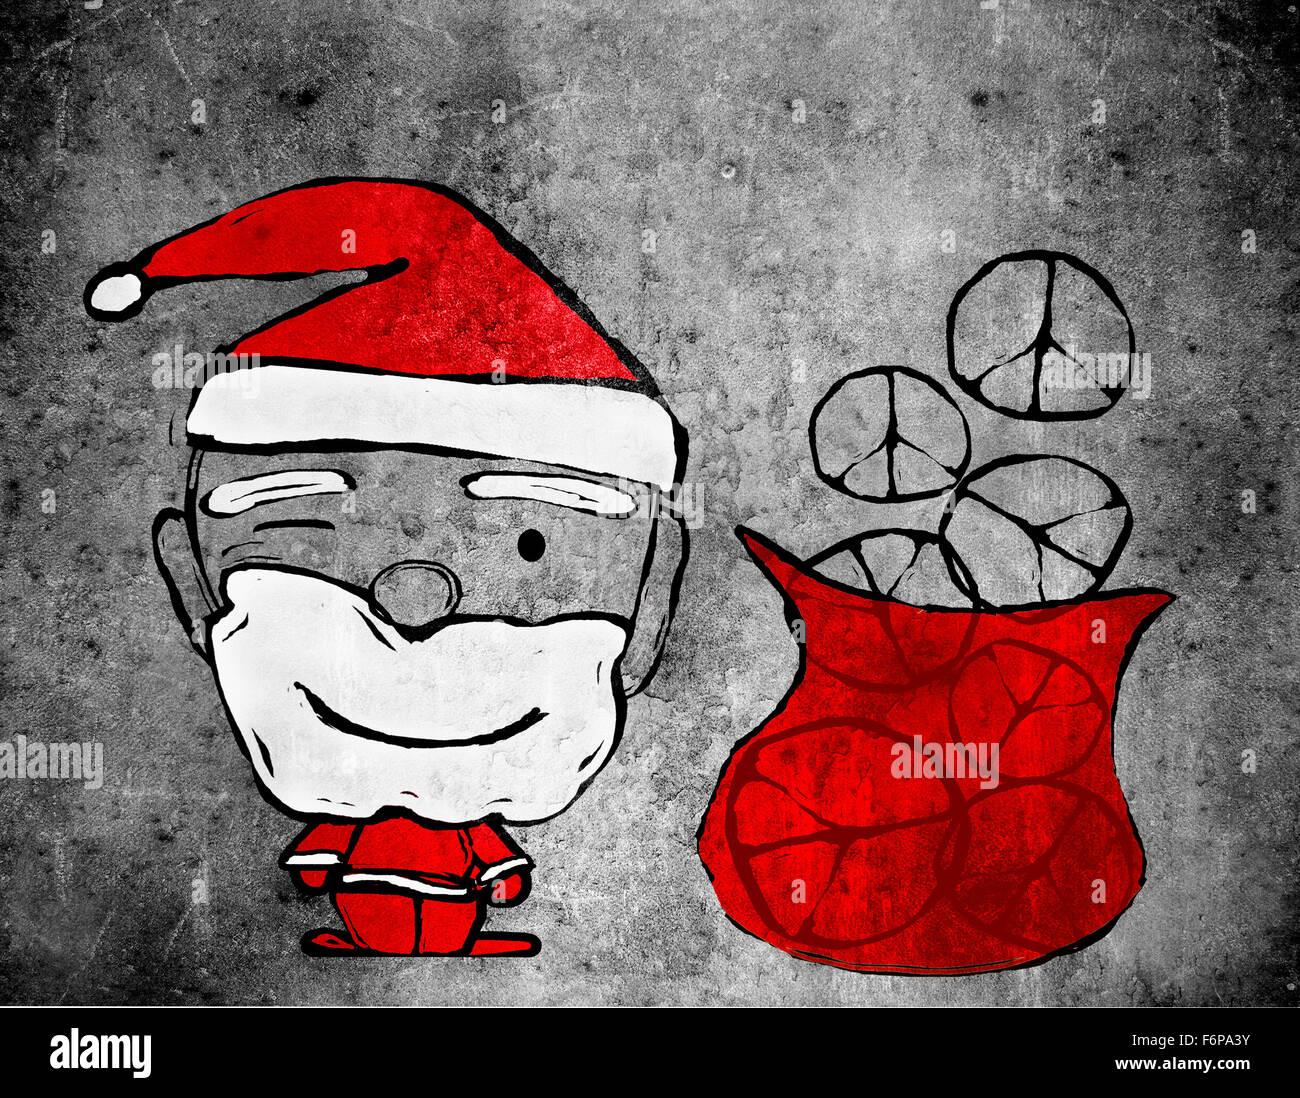 Santa Claus and peace symbols digital illustration - Stock Image